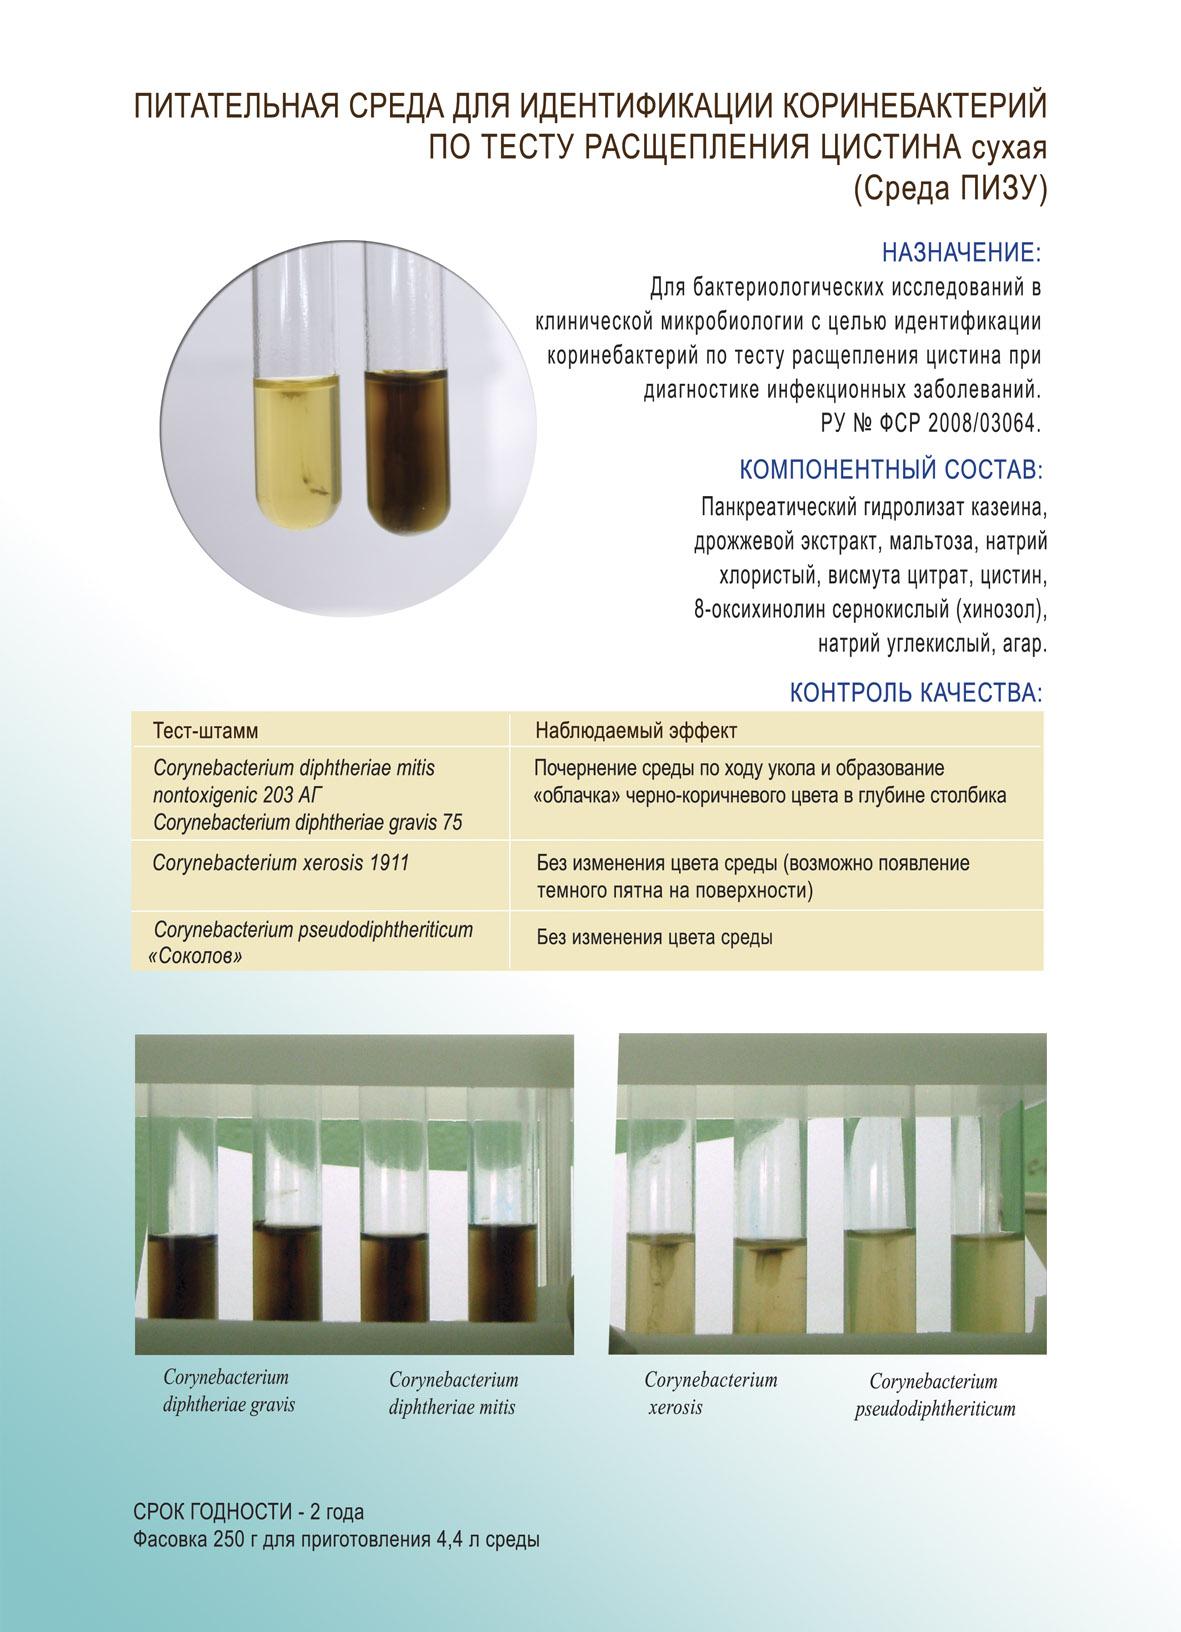 http://cs.sredy-obolensk.ru/-/qt-gKq19gAb63nH0leh_BQ/sv/image/72/e8/e6/253460/450/%D0%BF%D0%B8%D0%B7%D1%83.jpg?1460832442